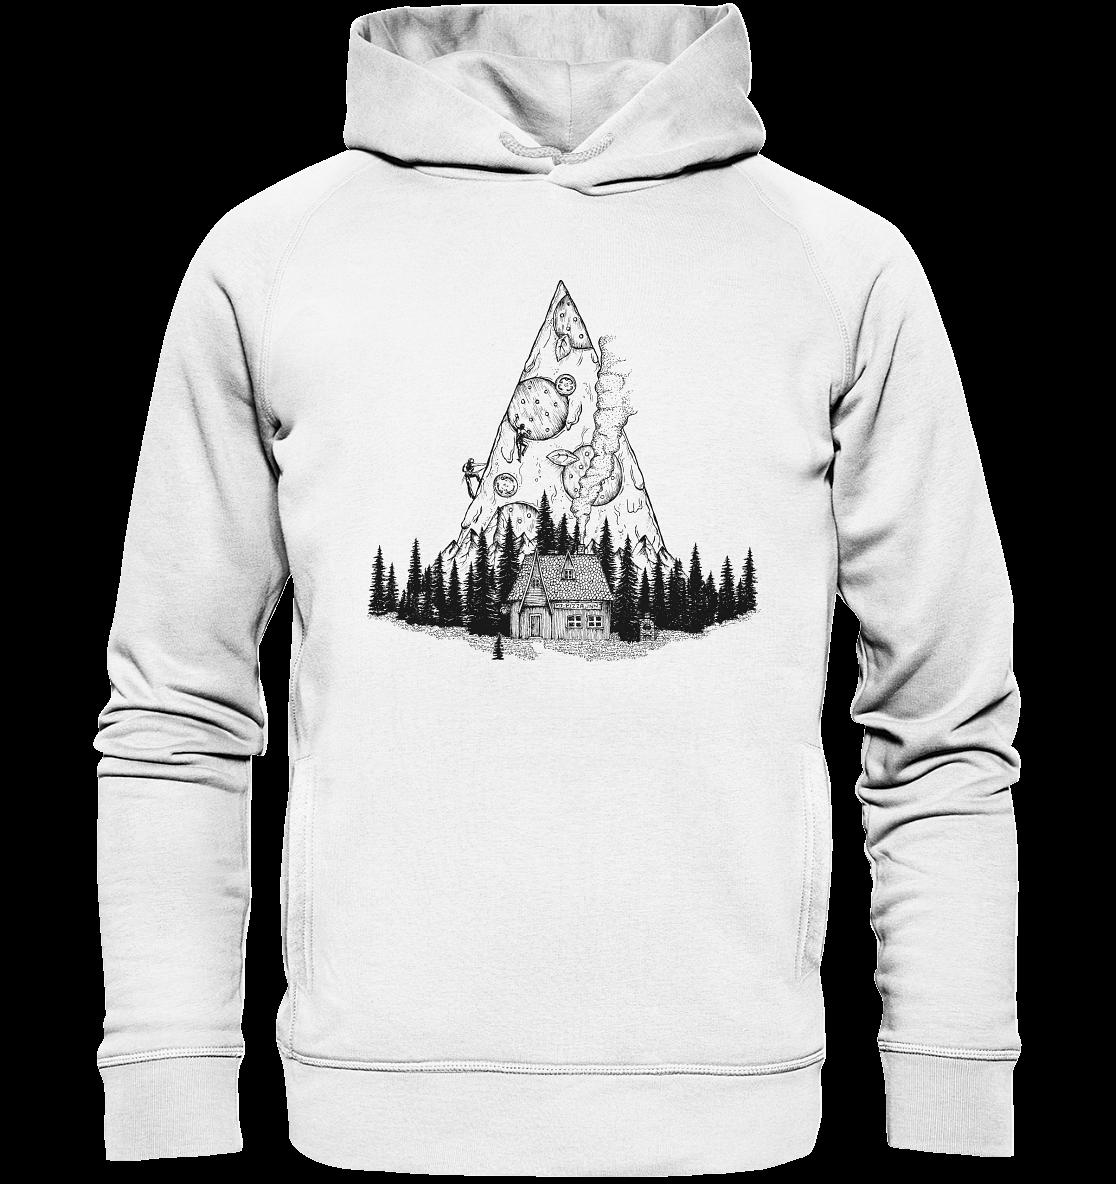 front-organic-fashion-hoodie-f8f8f8-1116x-6.png